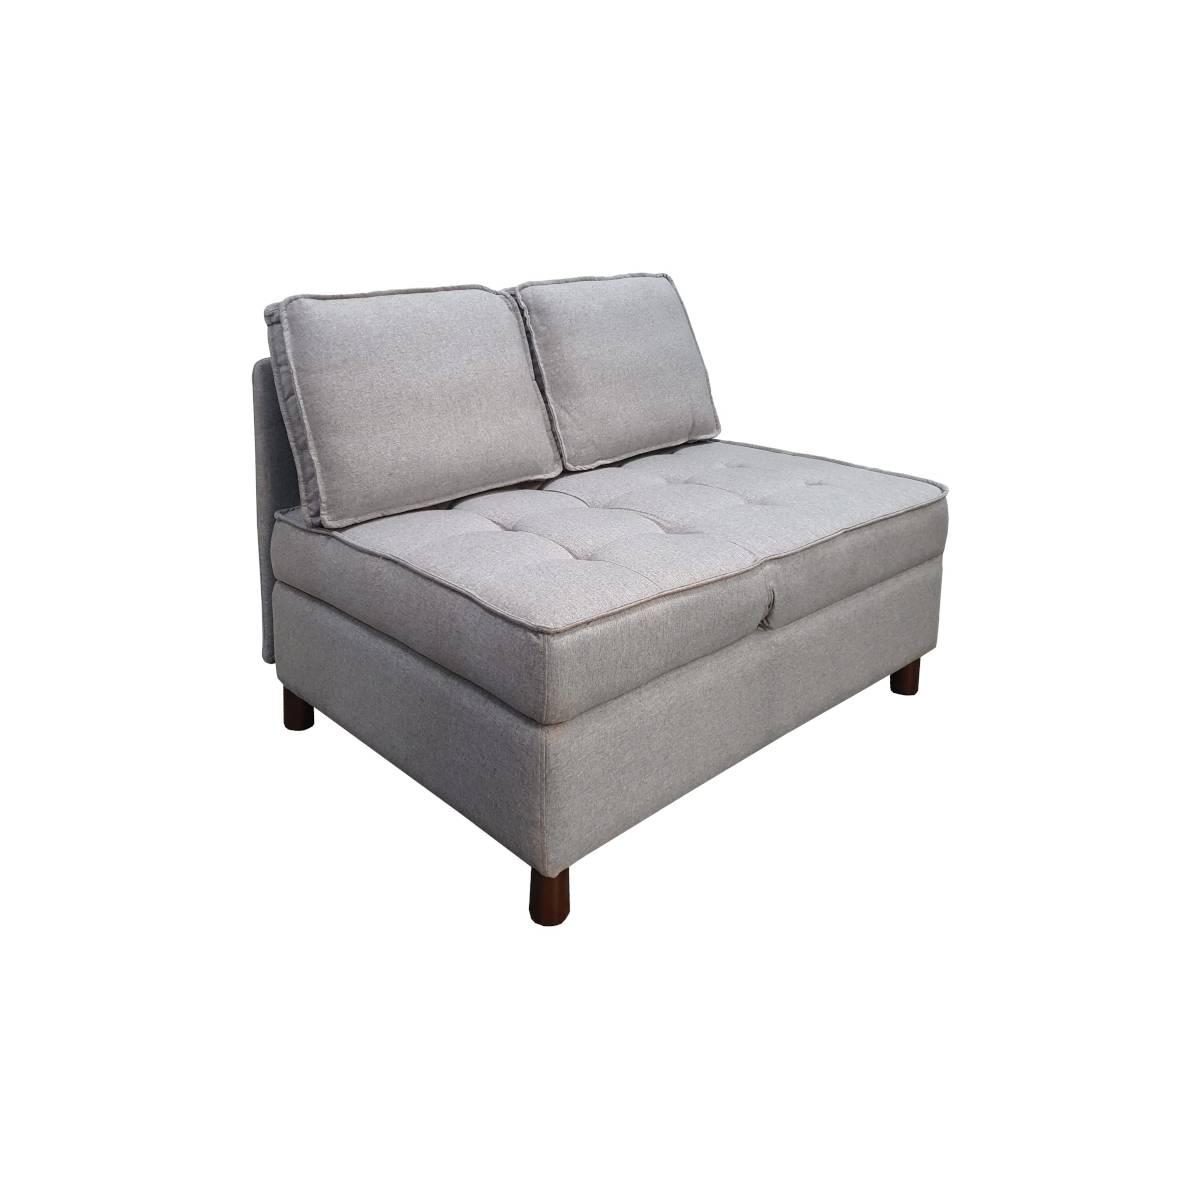 Faxon Sofa Bed